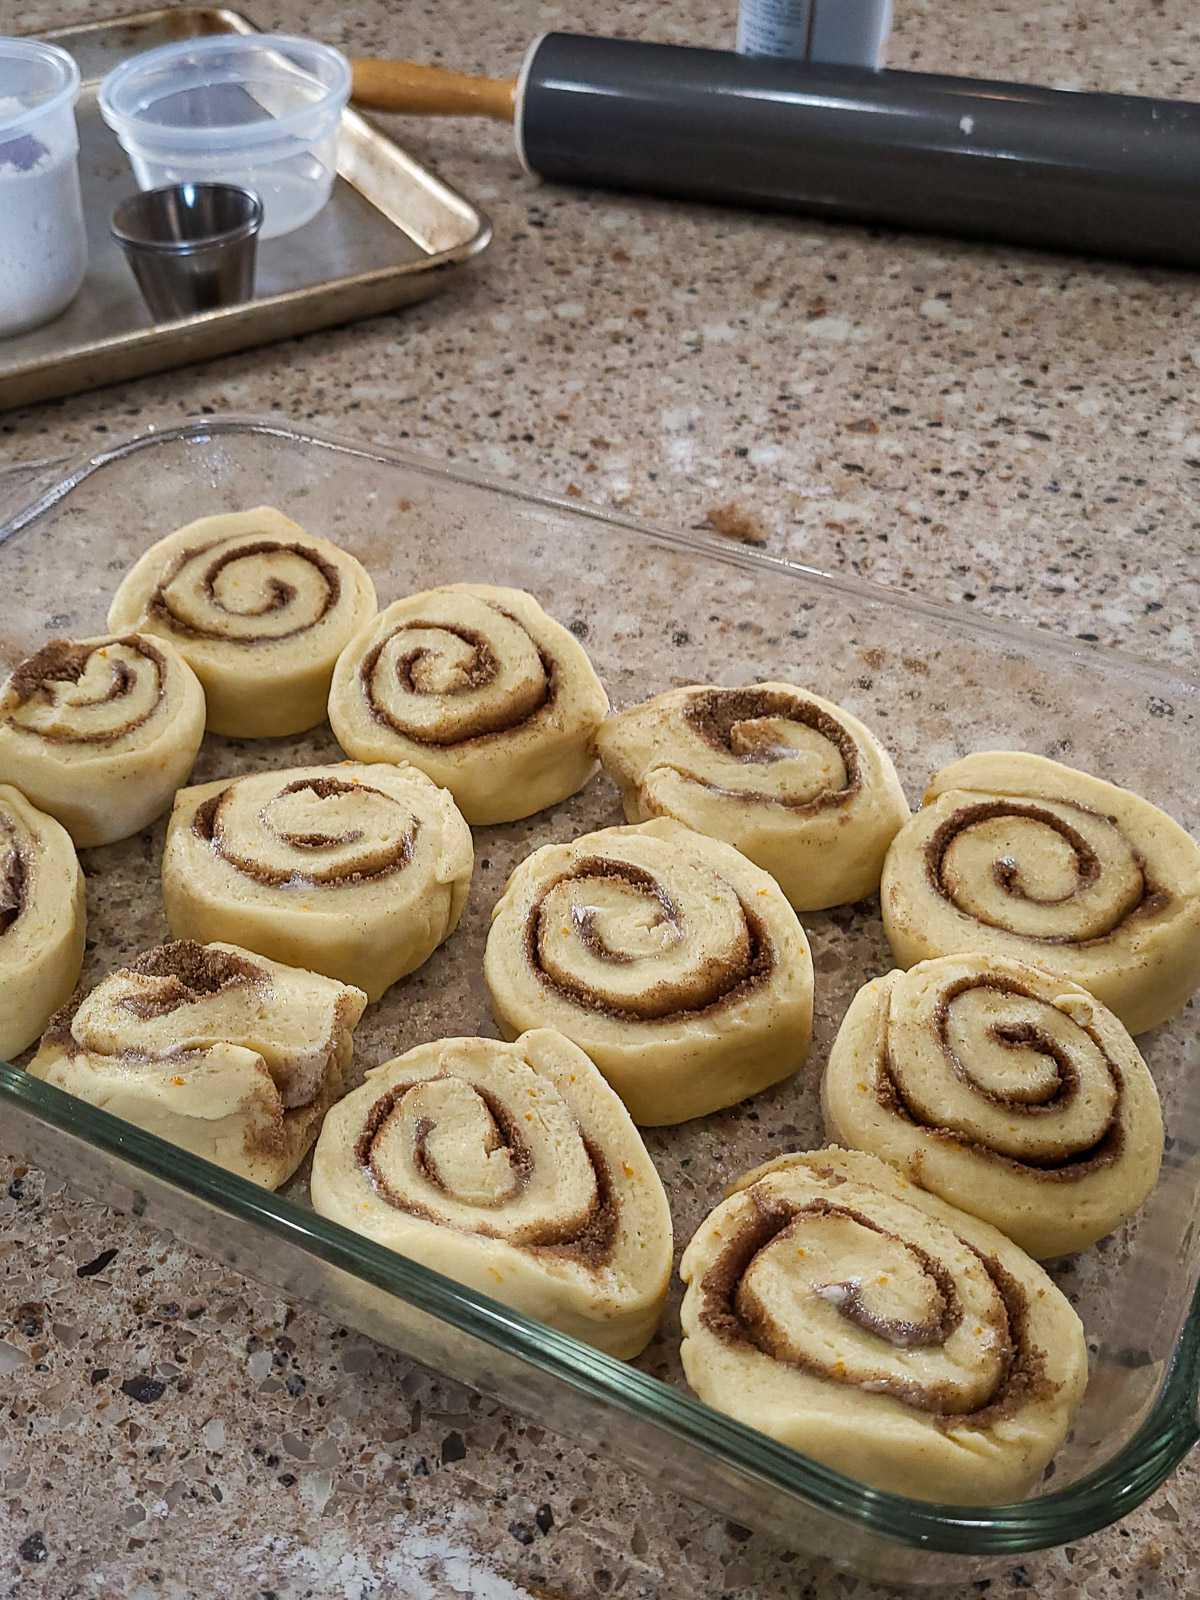 cinnnamon roll dough in a baking dish ready to raise